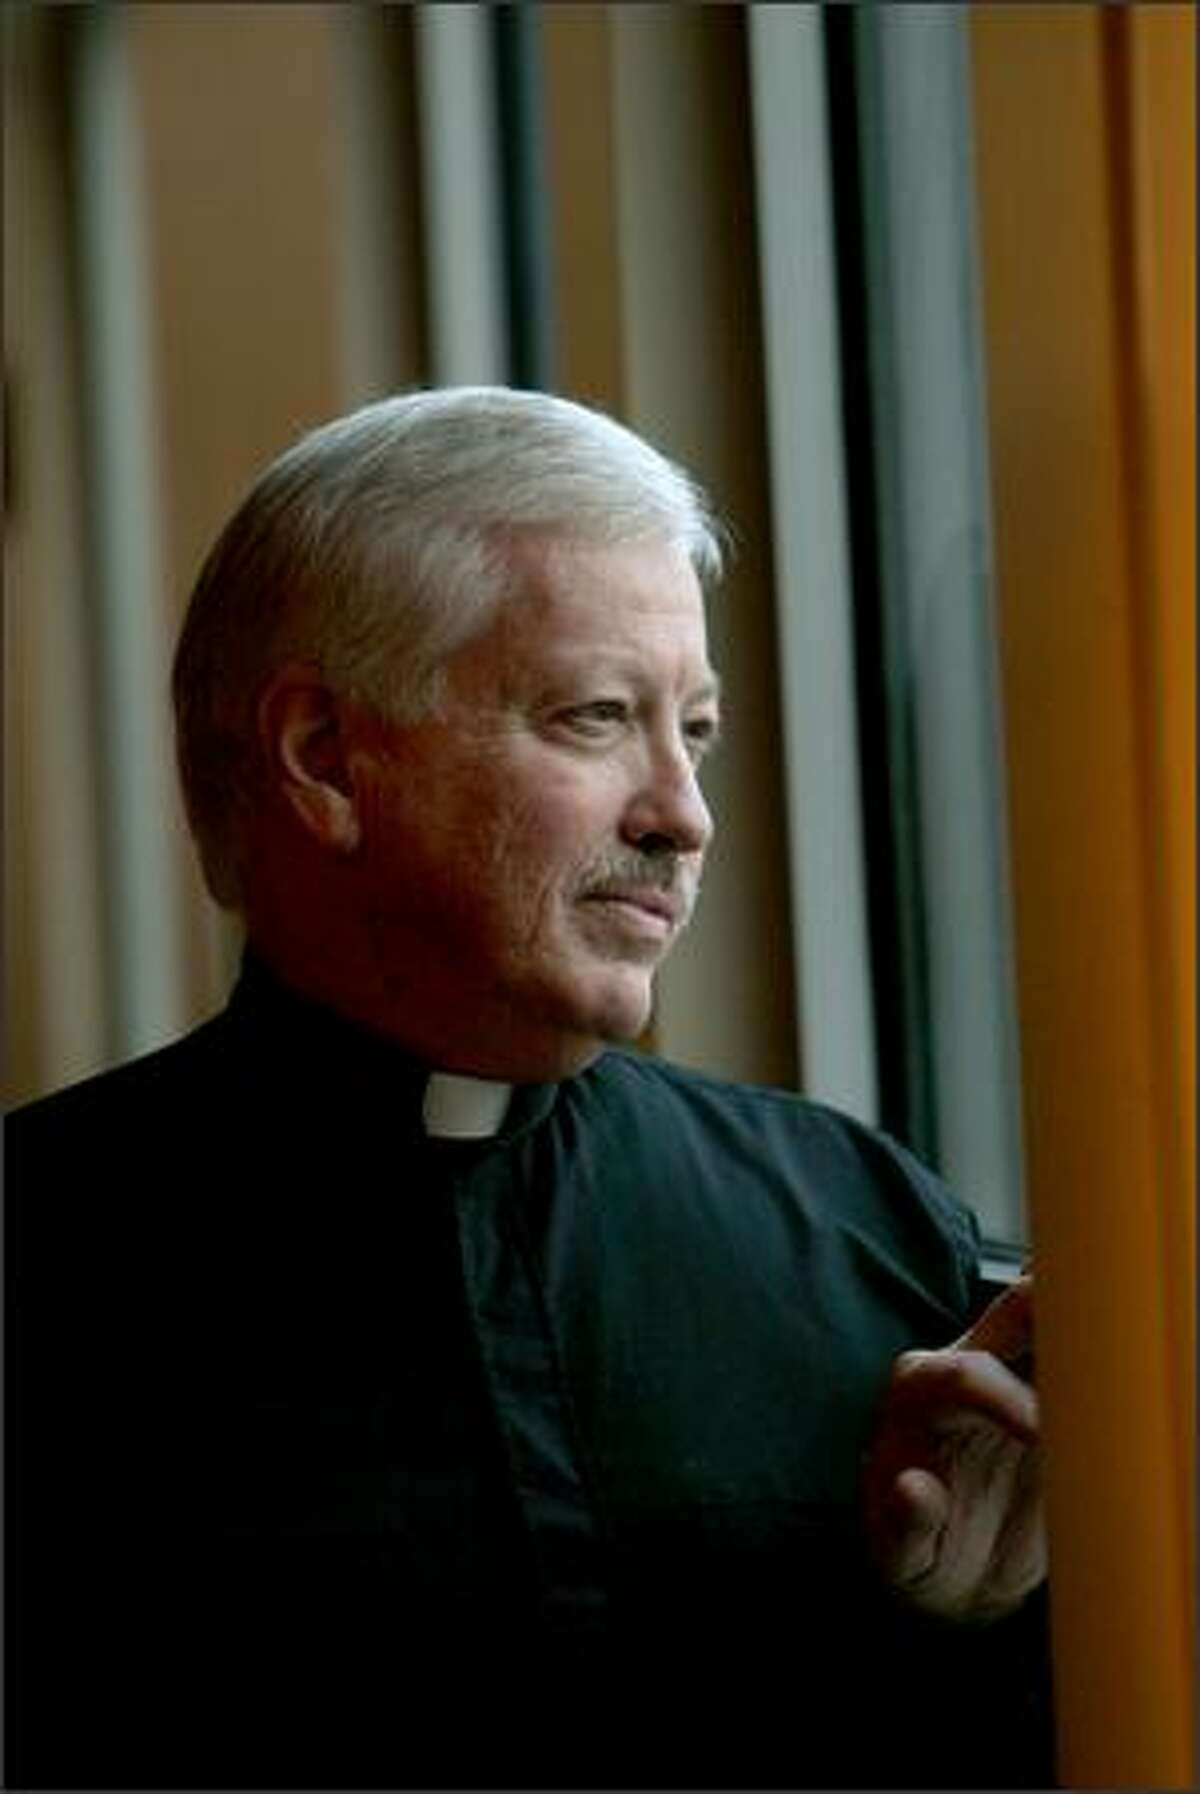 Vincent Lachina is a chaplain at Seattle's Planned Parenthood.